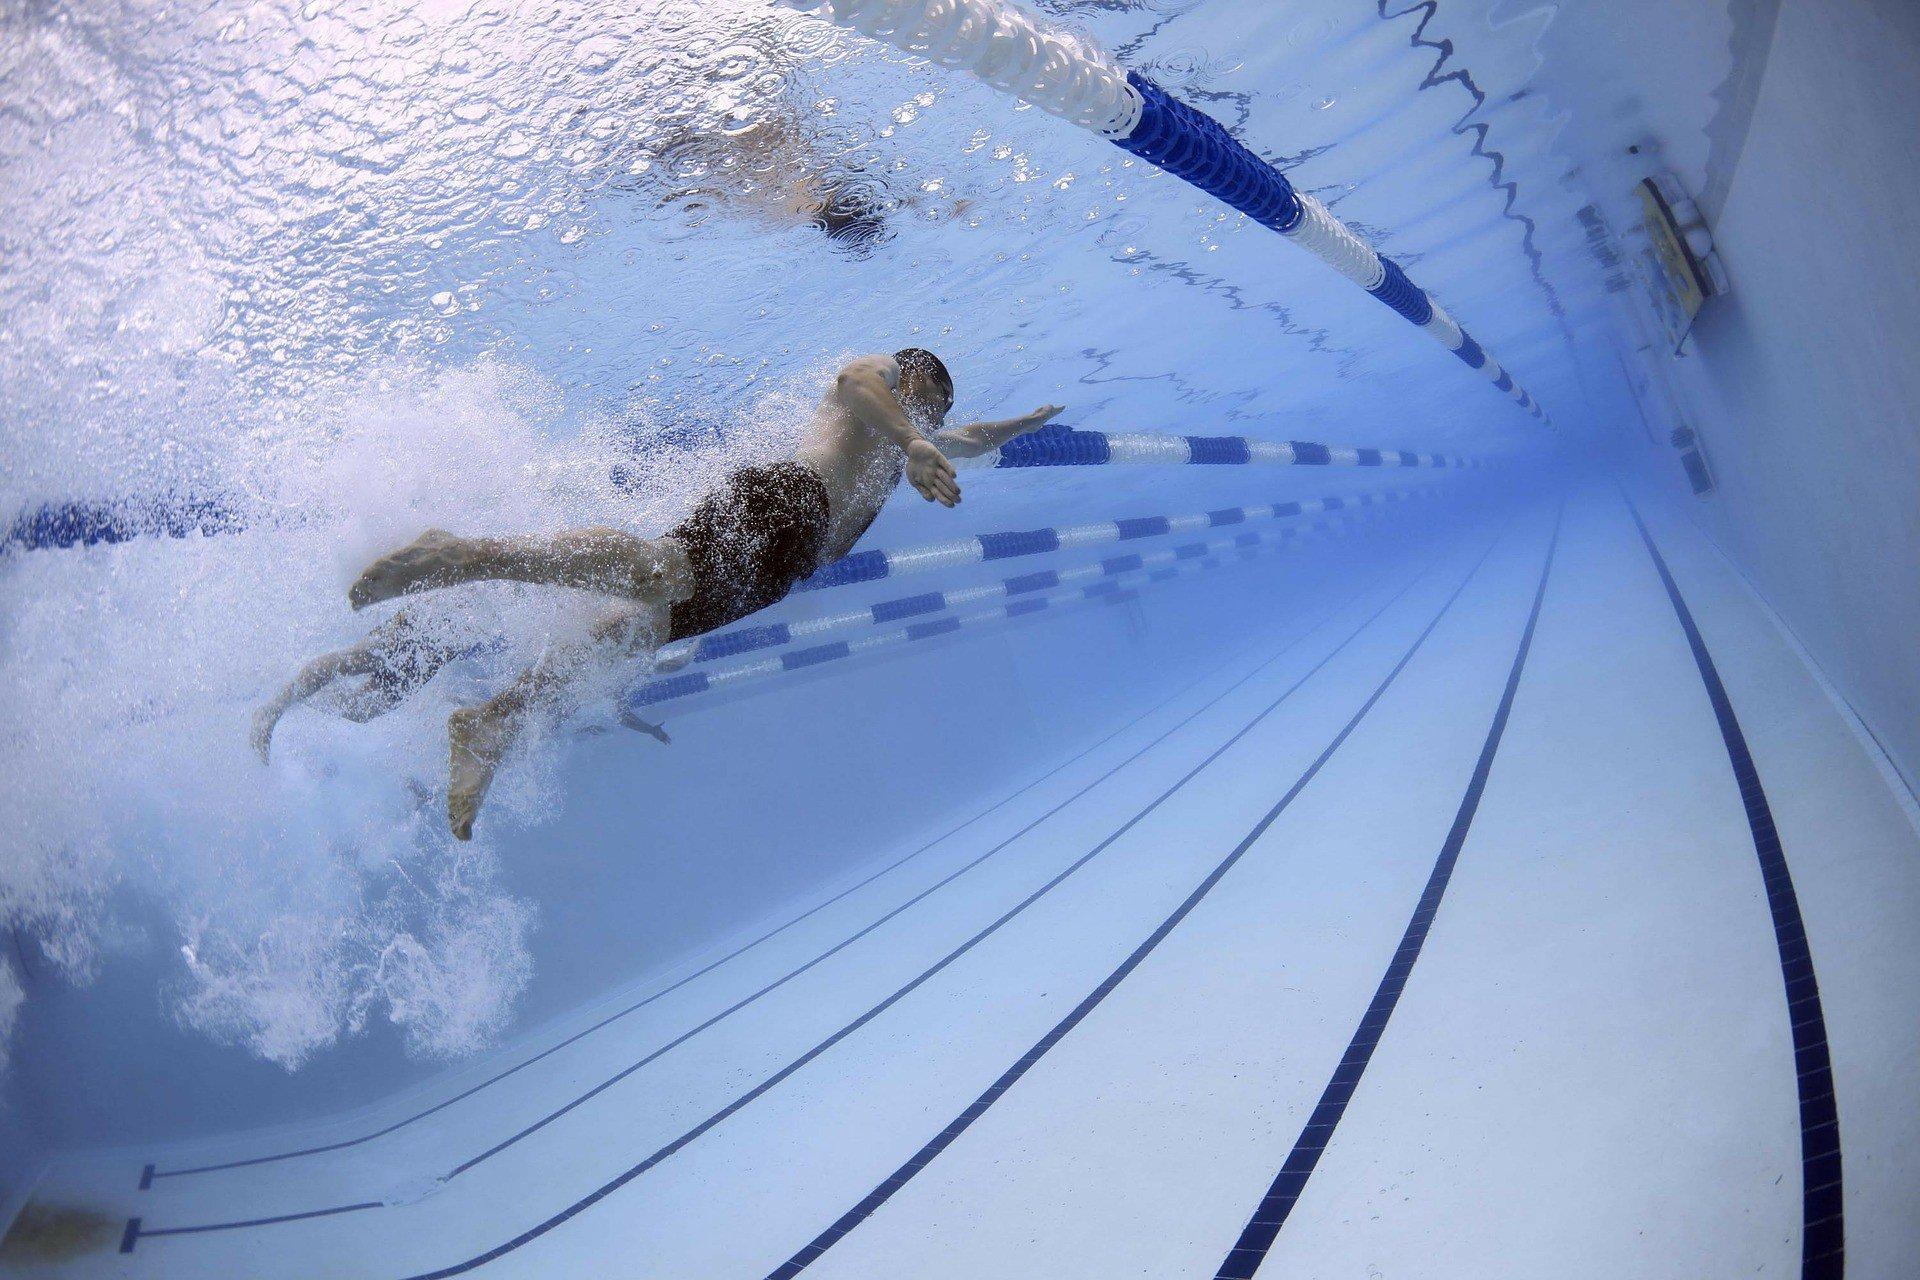 aprire una piscina